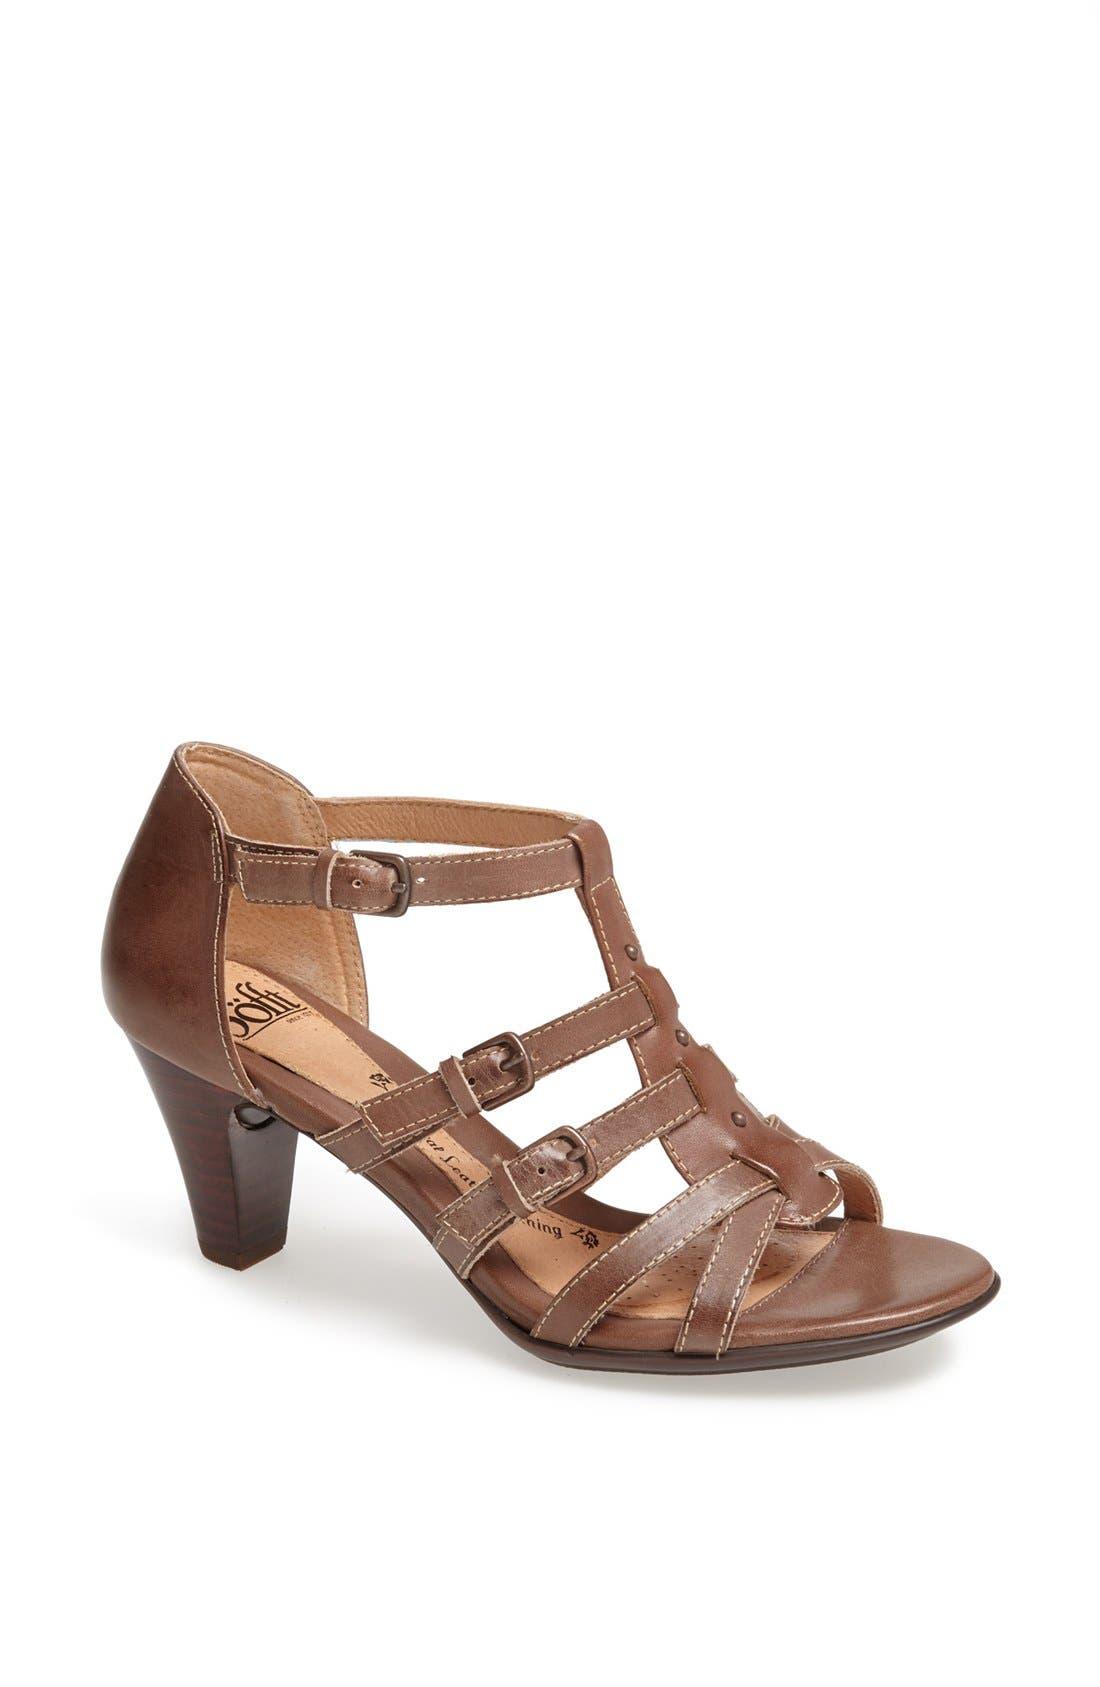 Main Image - Söfft 'Solana' Sandal